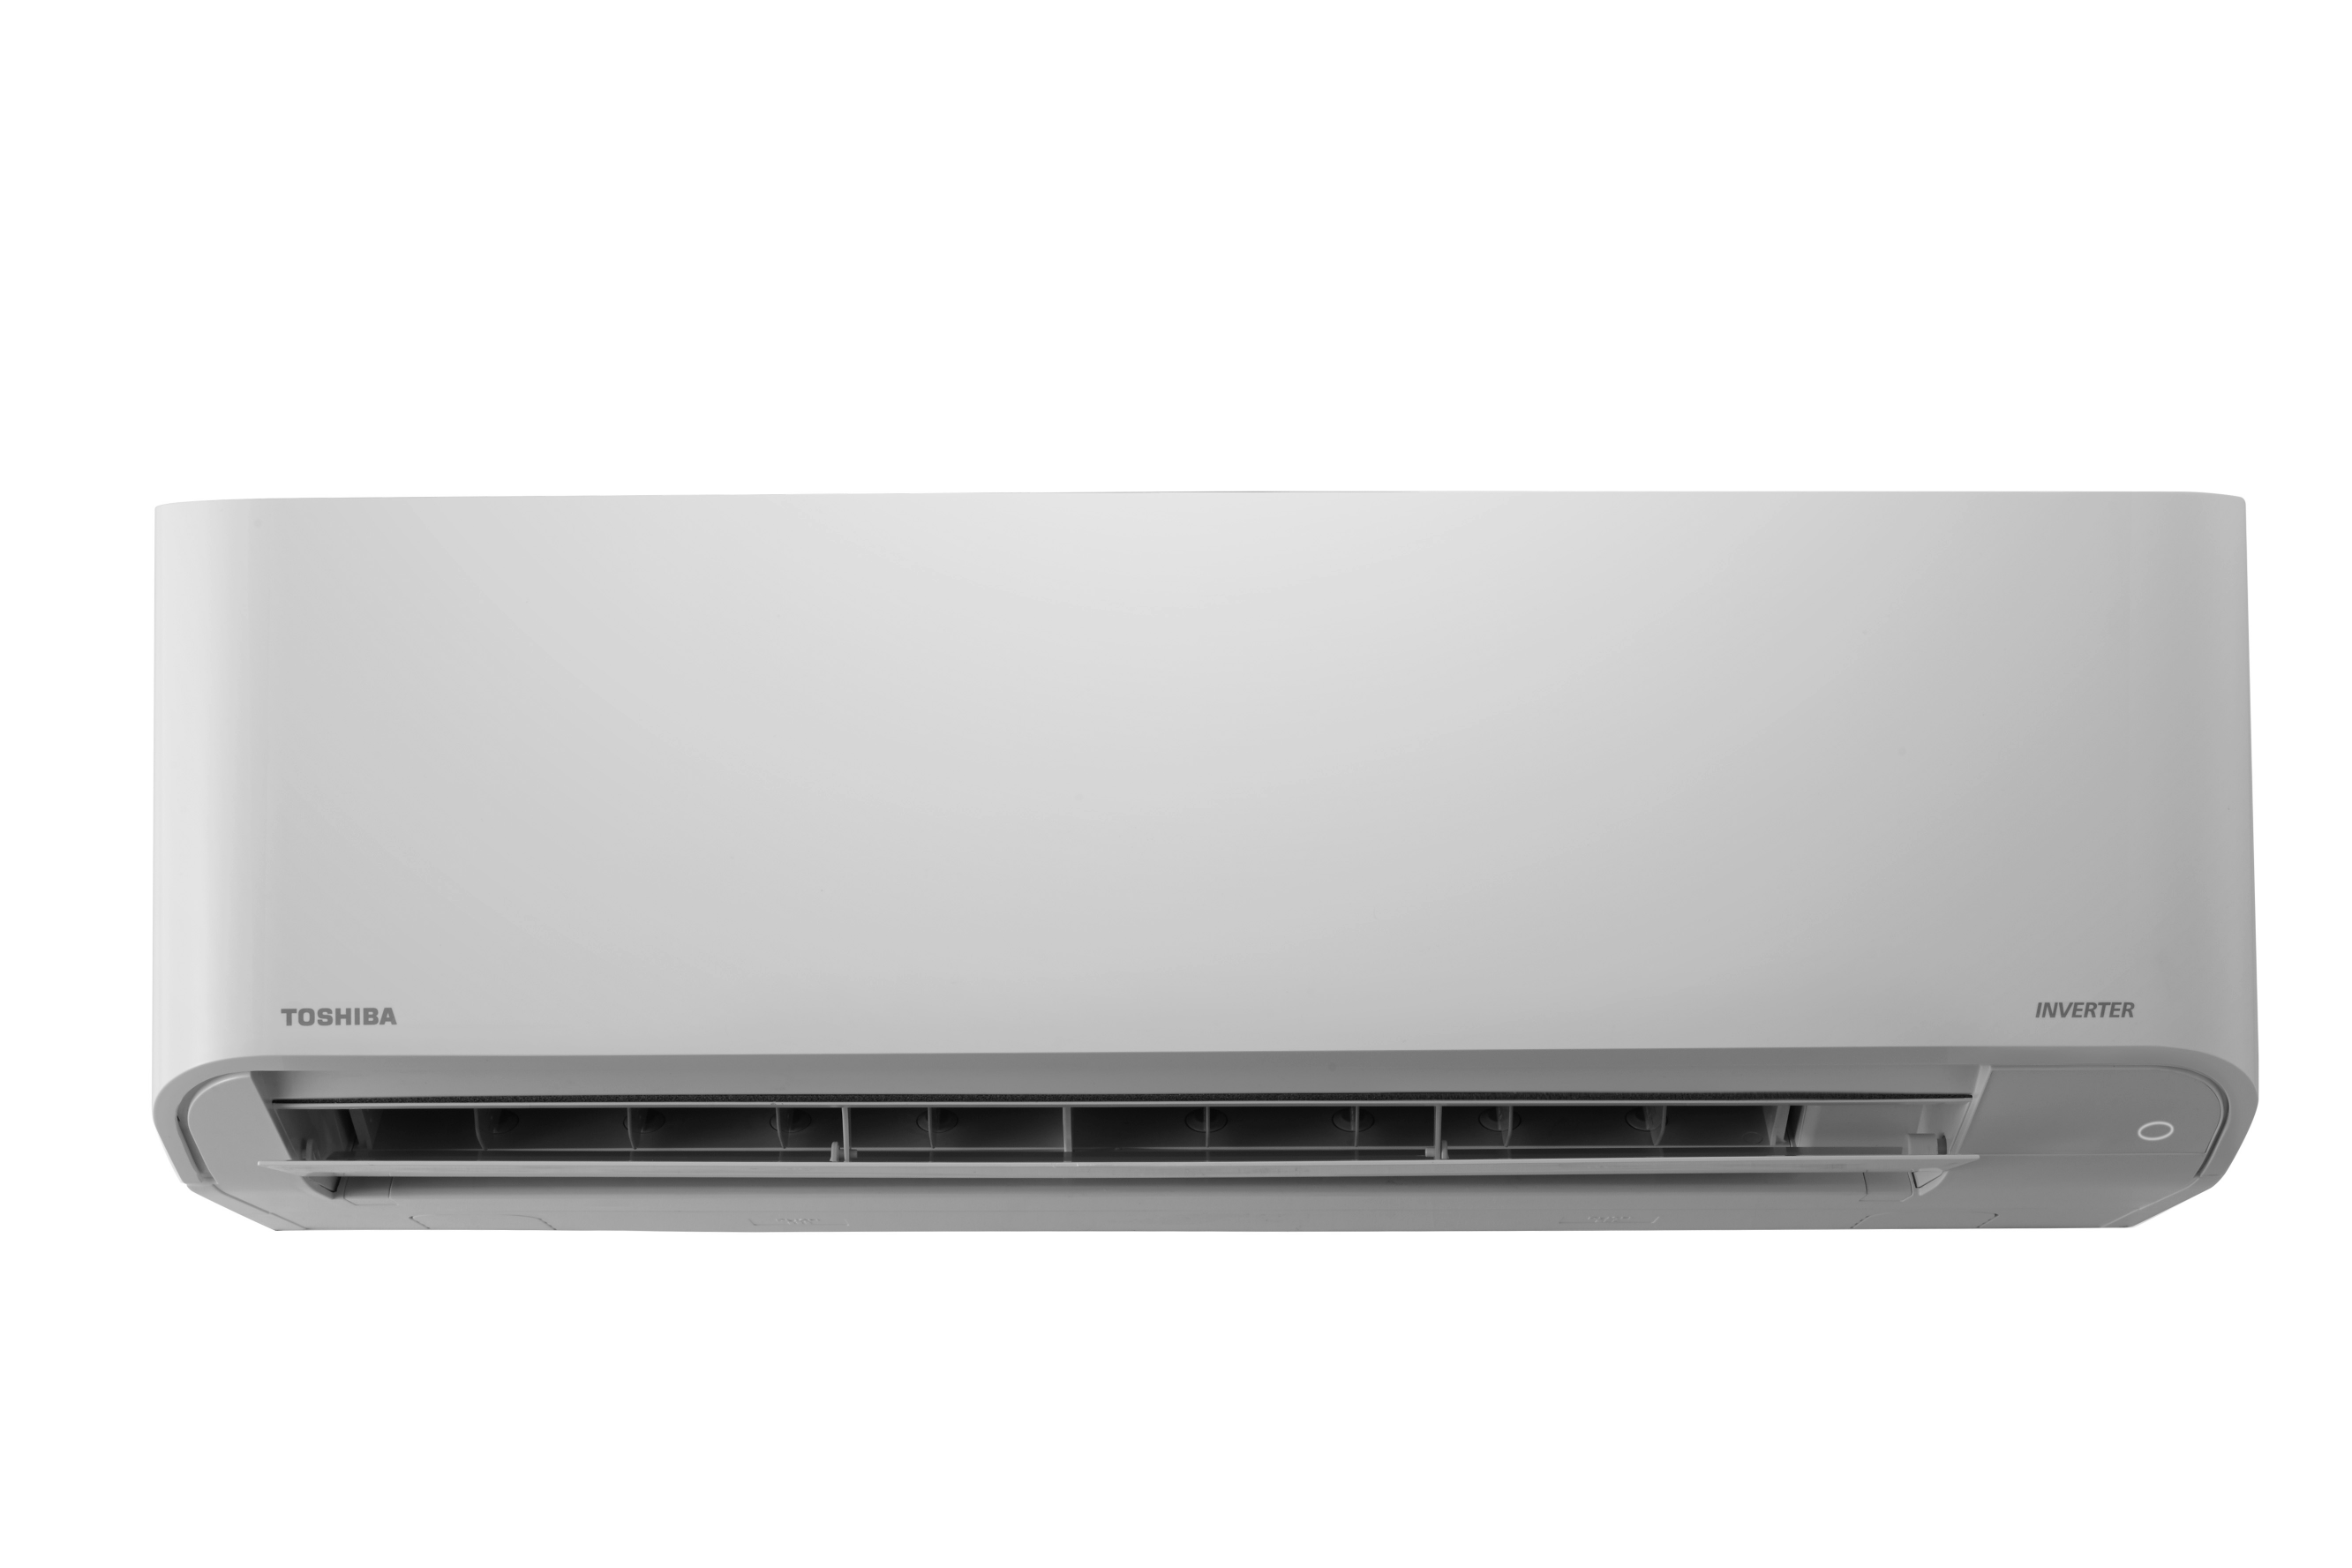 Điều hòa Toshiba 13000BTU 2 chiều inverter RAS-H13S3KV-V